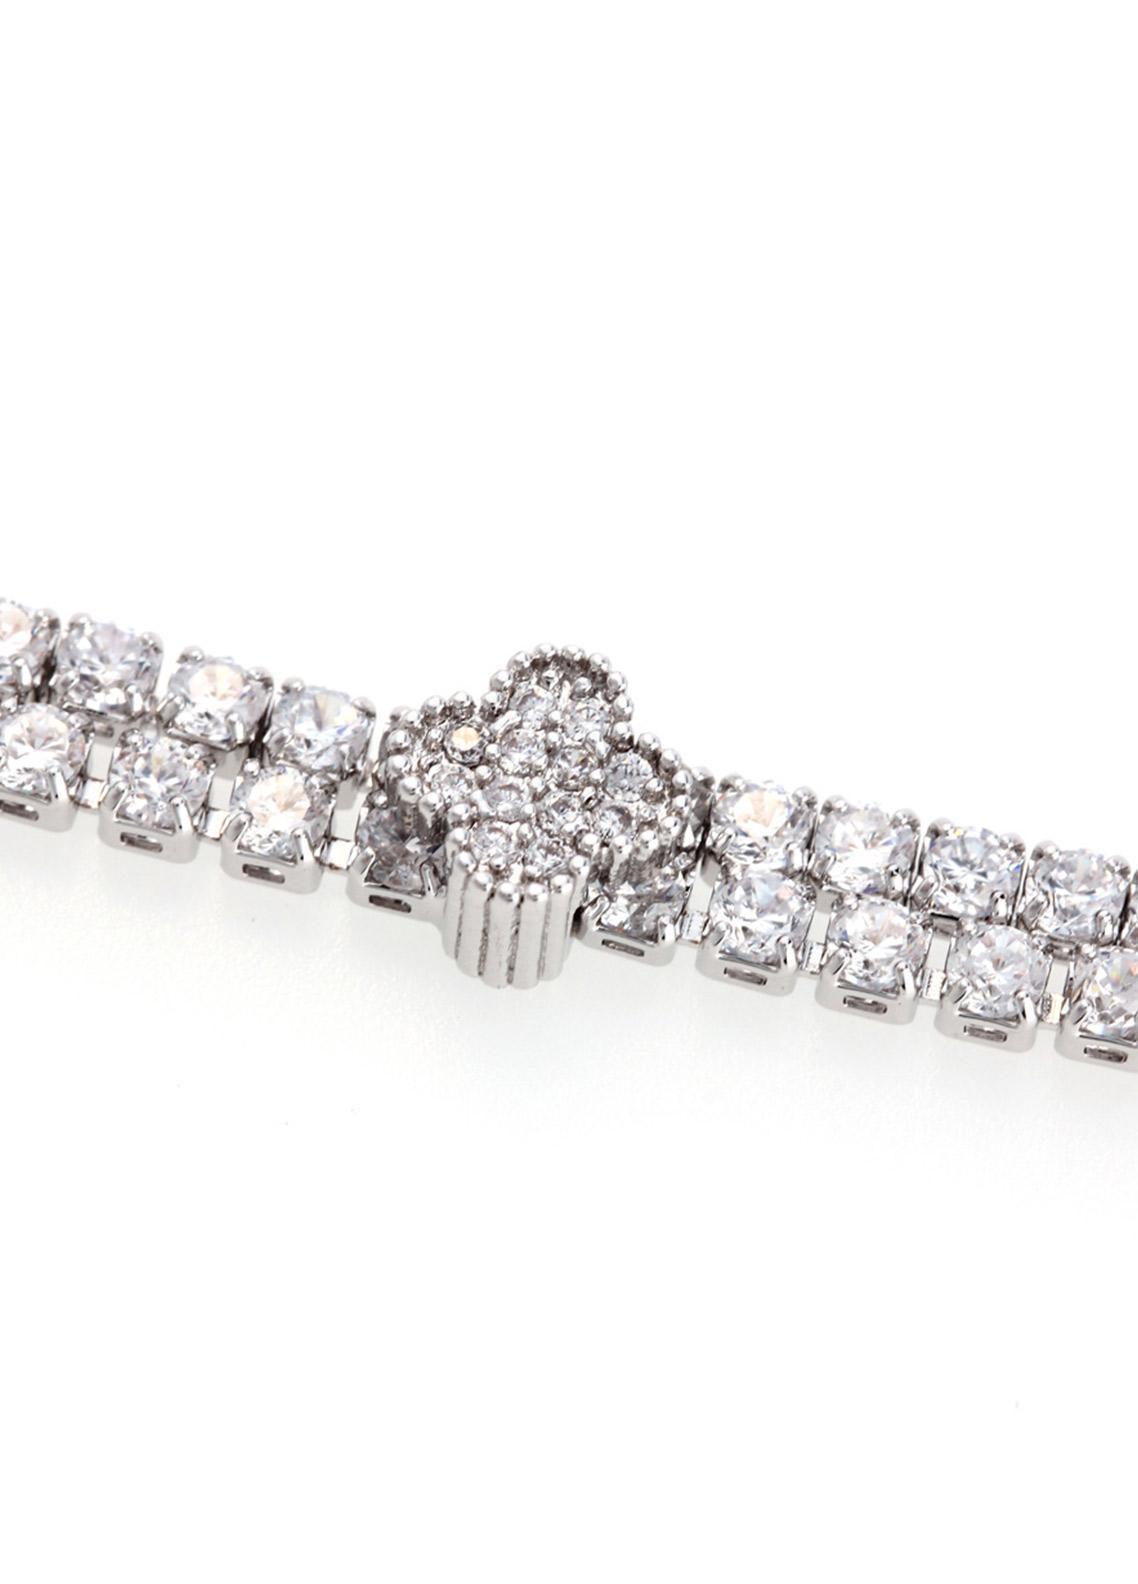 Anna Grace London Silver Crystal Sparkling Bracelet AGB0062 - Ladies Jewellery